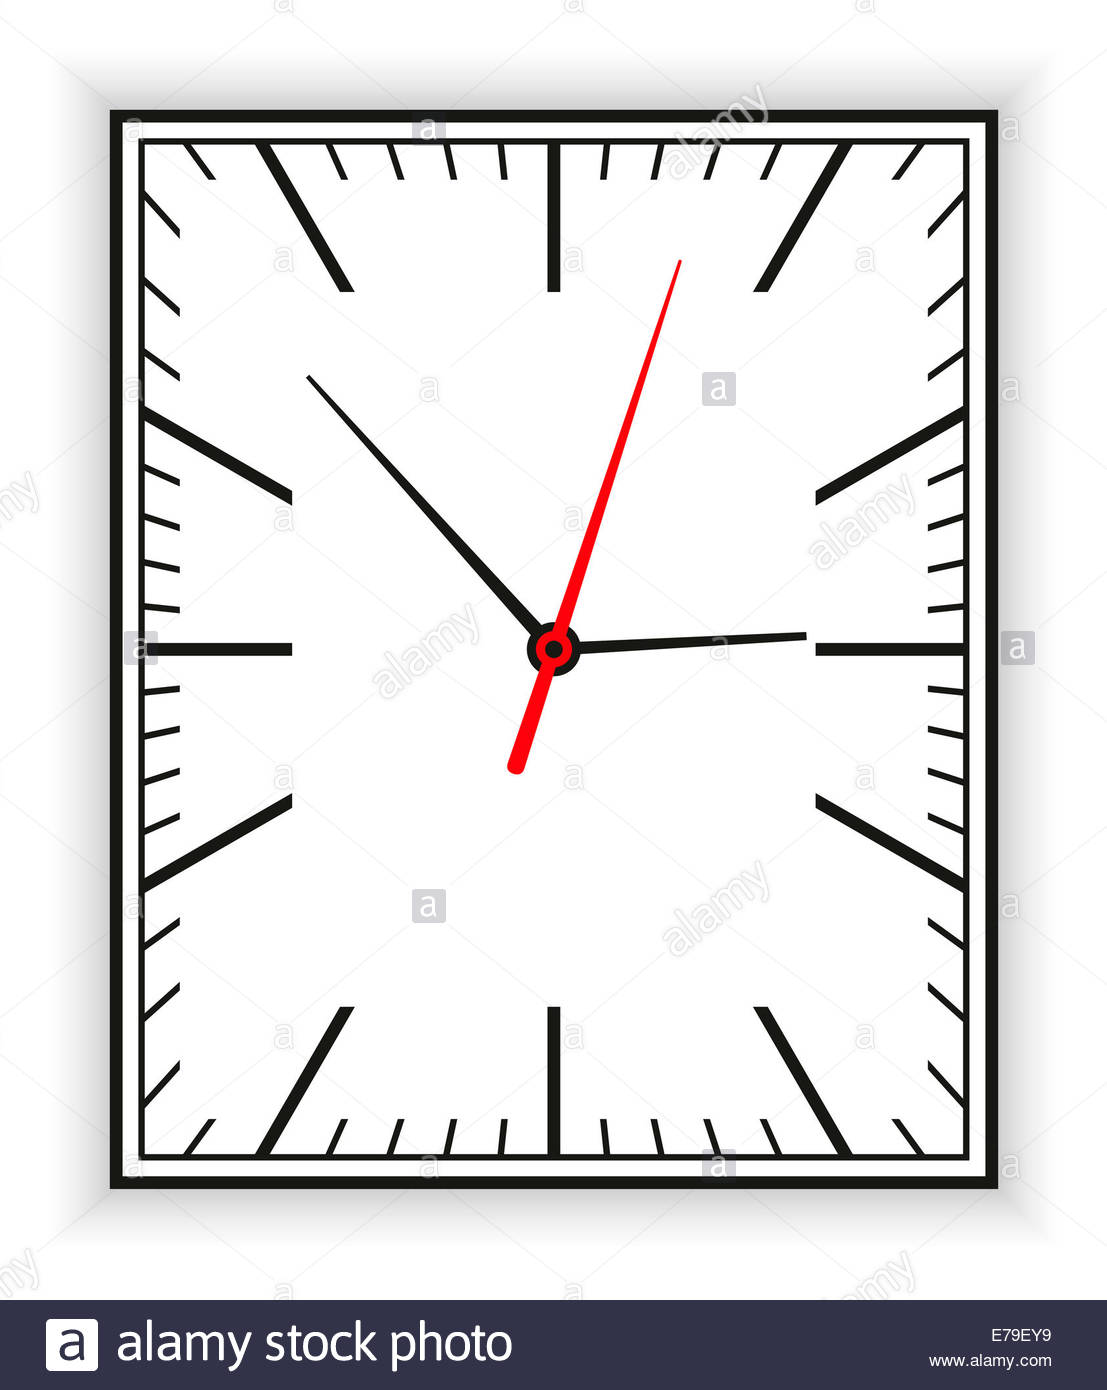 clock clipart rectangle